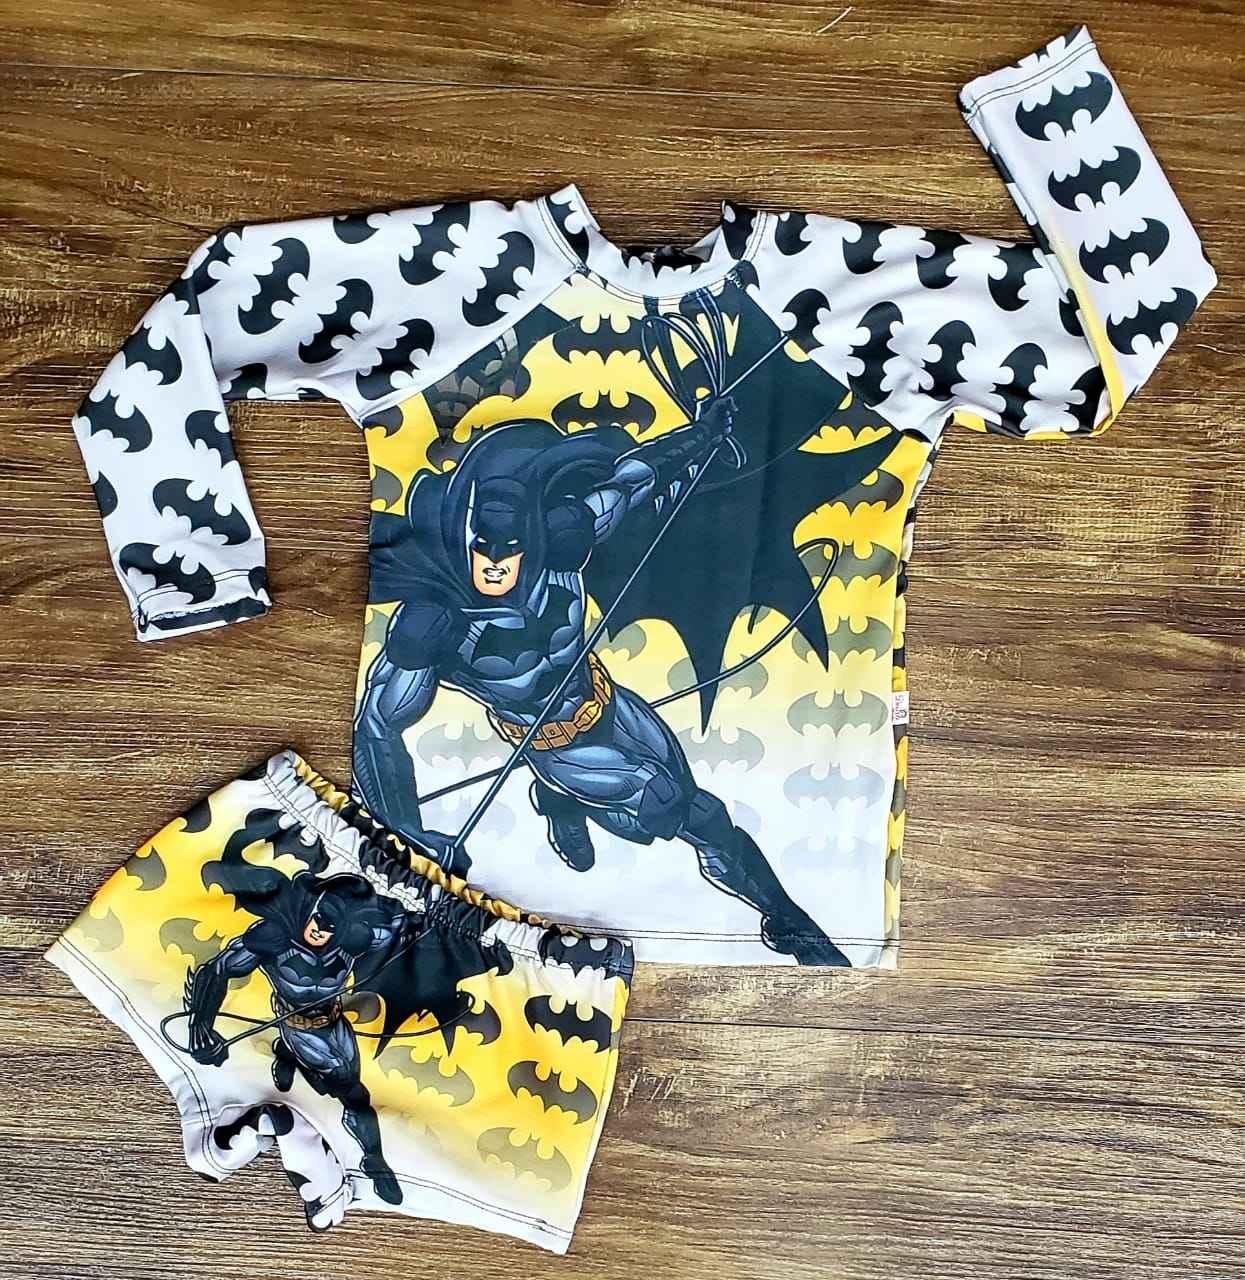 Kit Praia Batman - Sunga e Camiseta UV